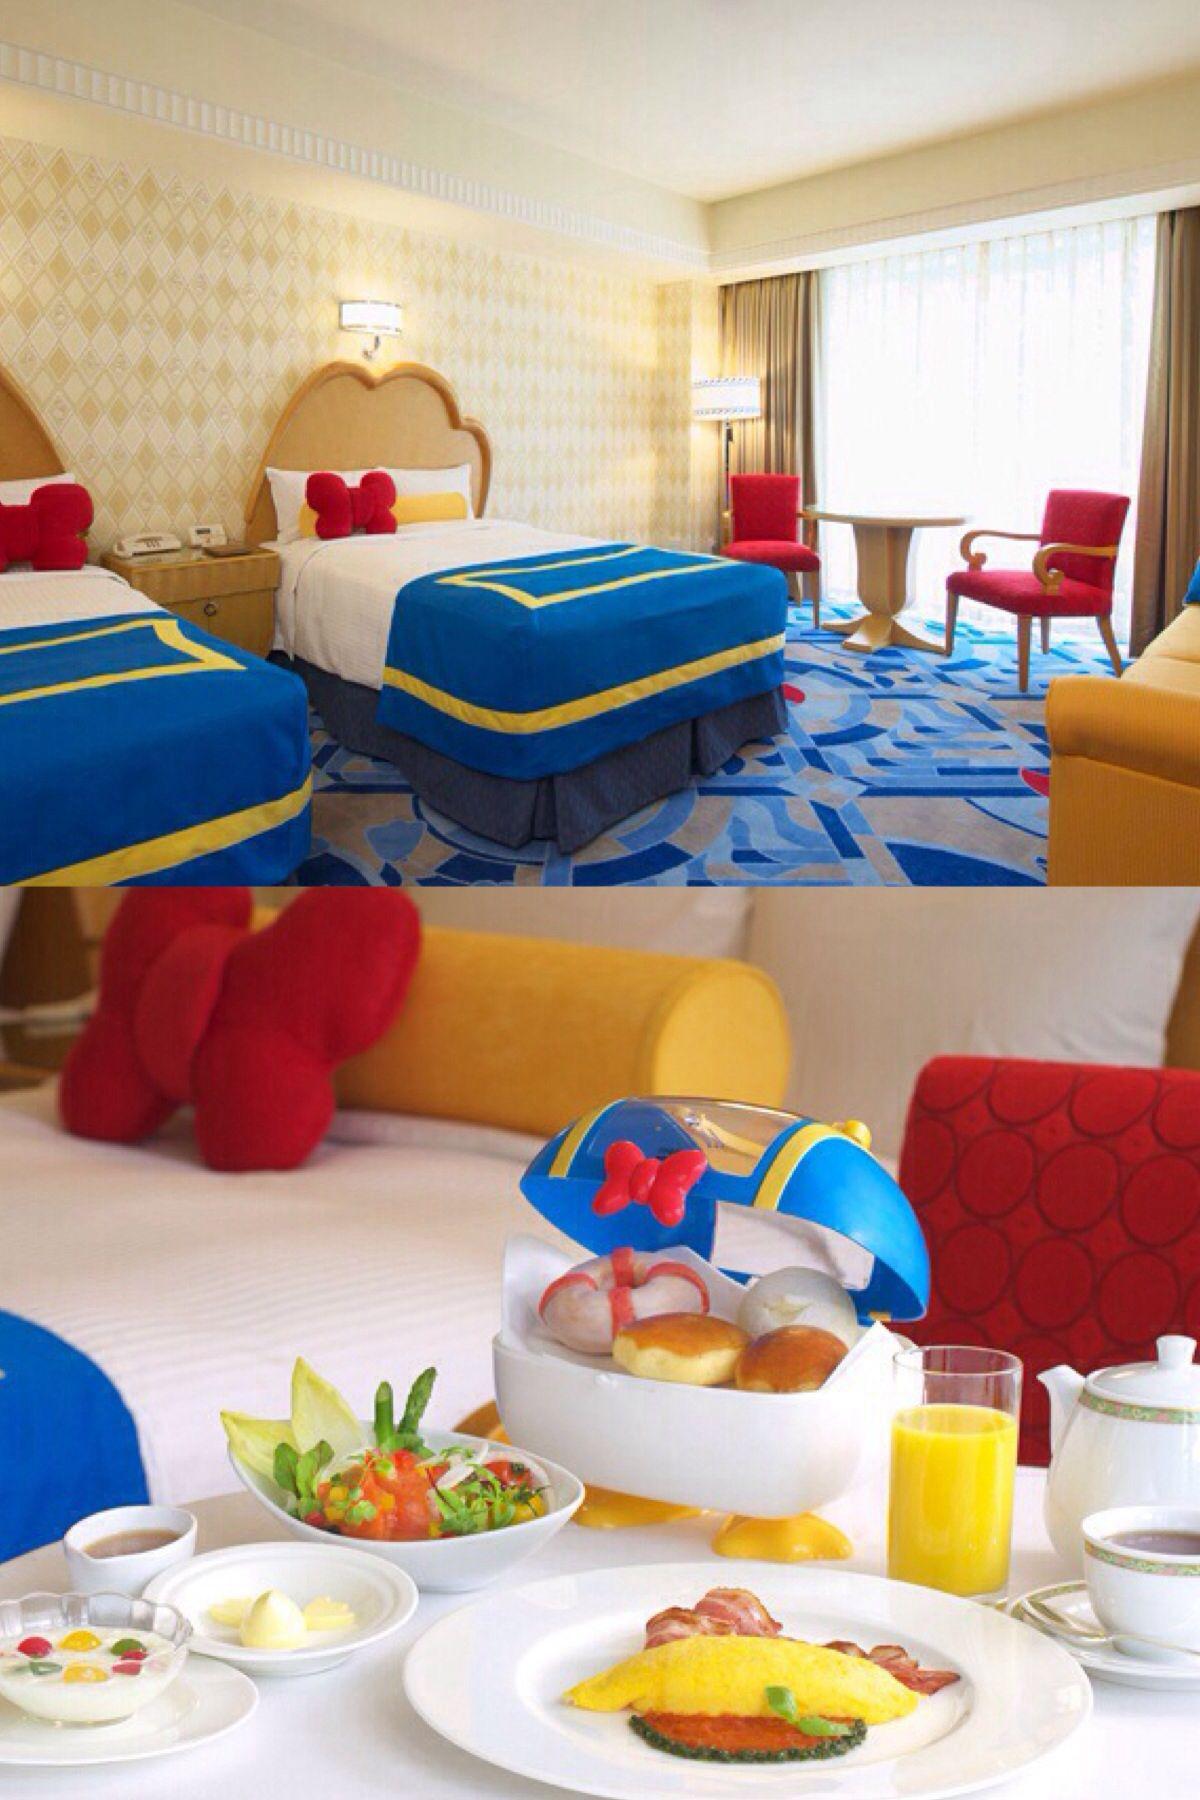 Donald Duck Themed Room At The Ambassador Hotel At Tokyo Disneyland My Fantasies Pinterest